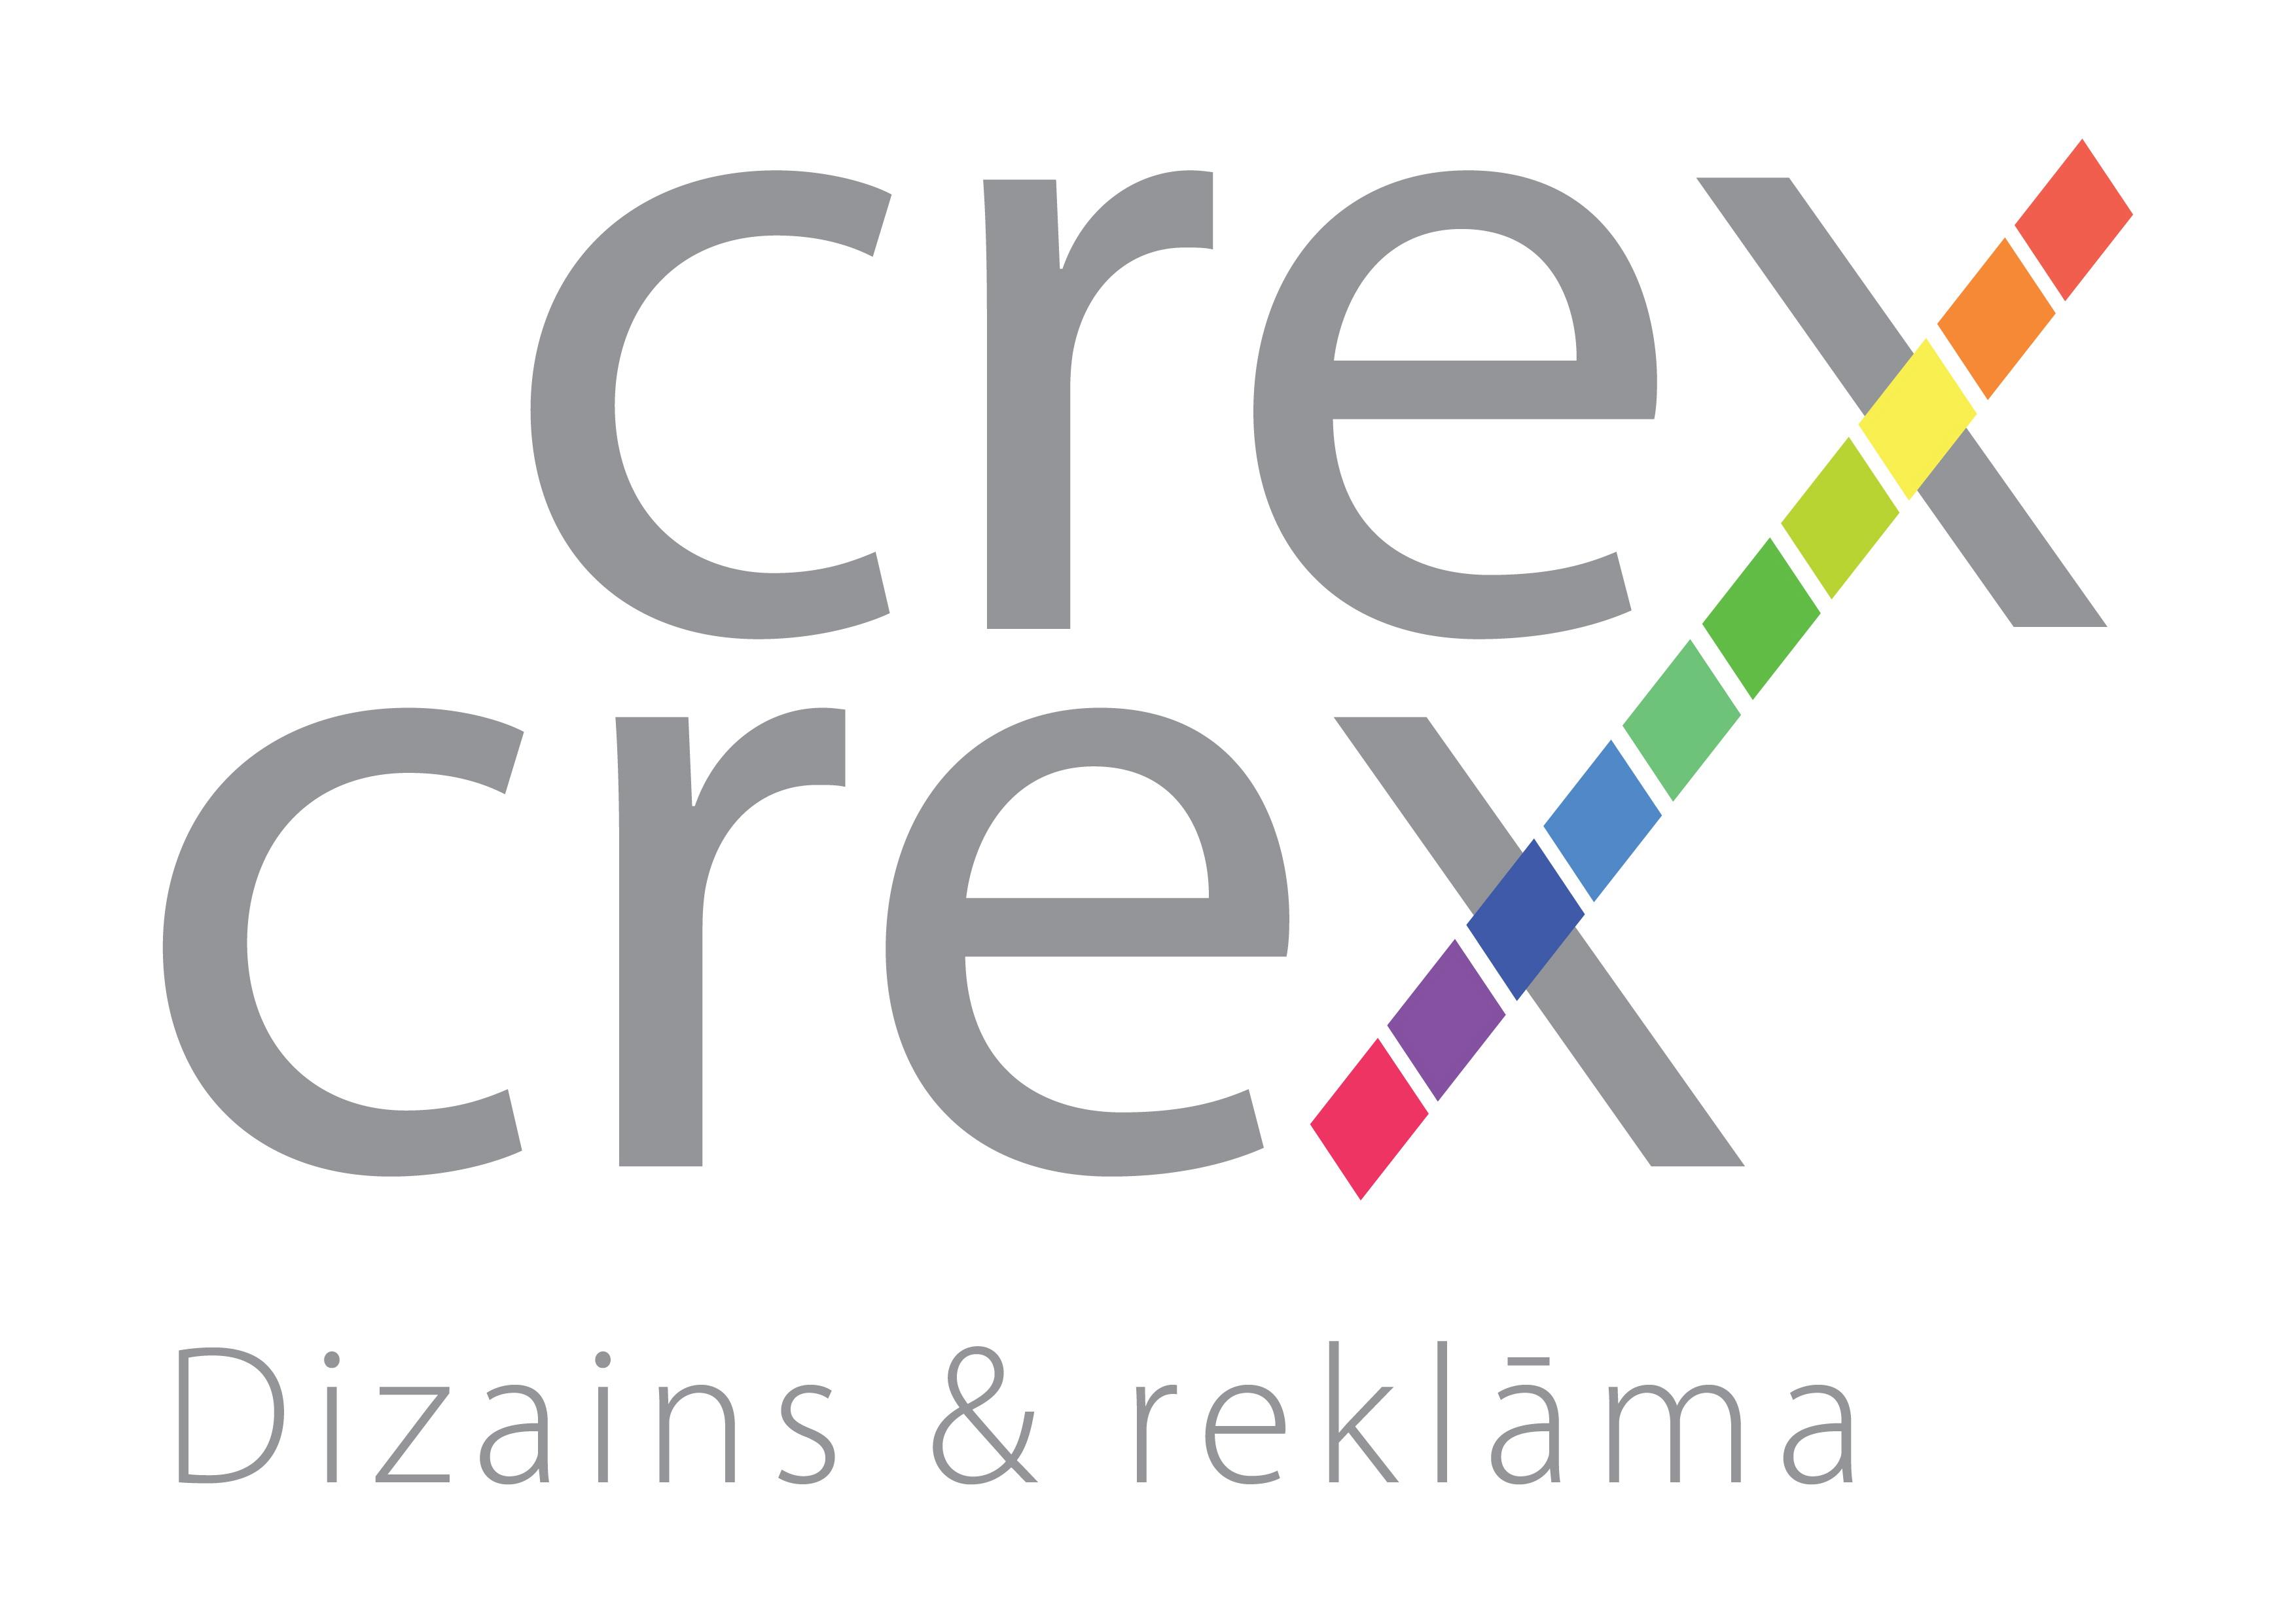 crexcrex